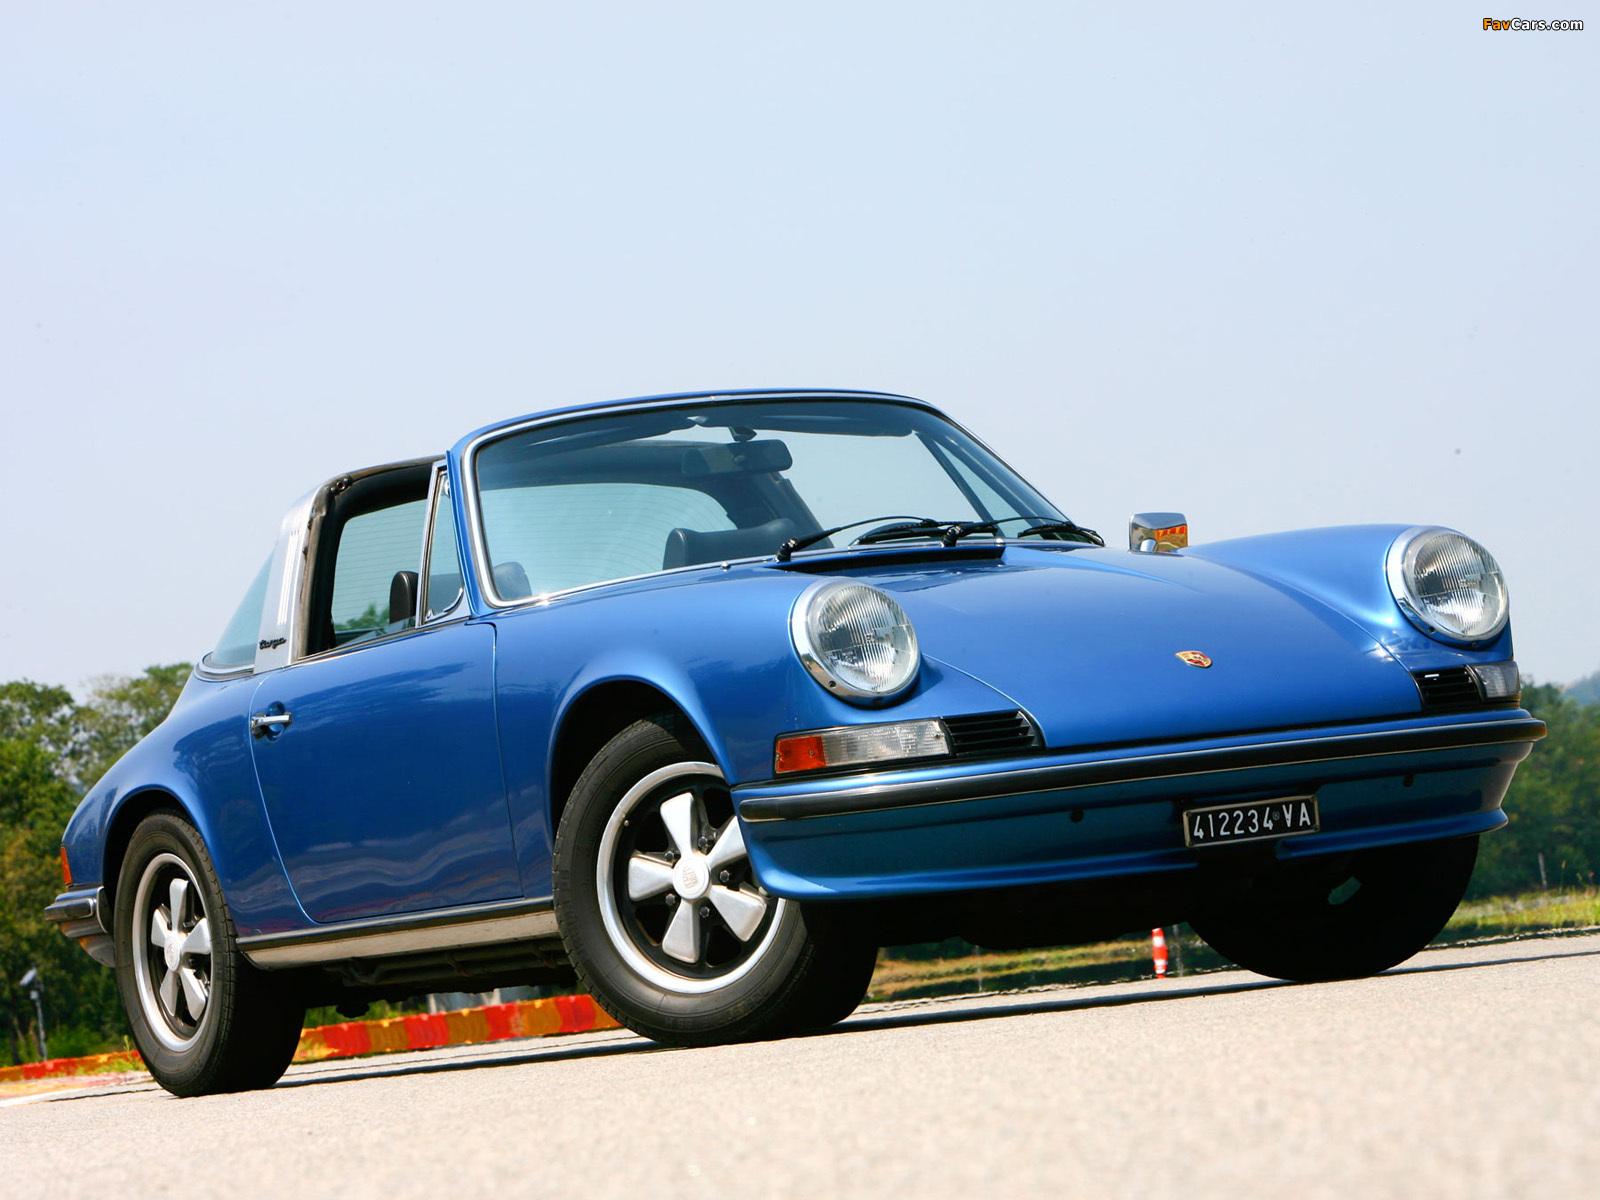 Porsche 911 S 2 4 Targa 901 1971 73 Images 1600x1200